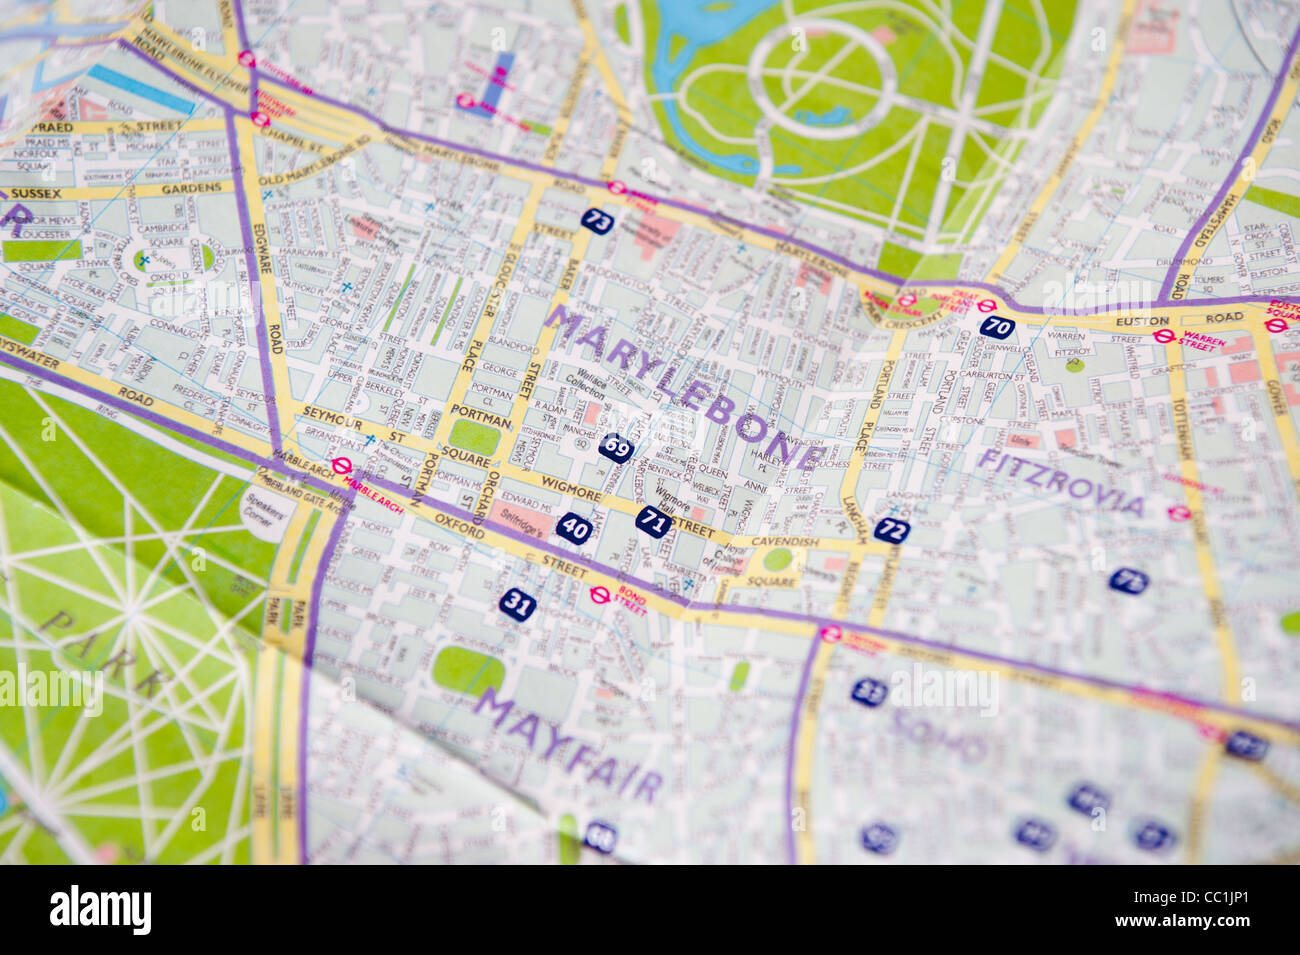 Kensington Map Royal Borough of Kensington and